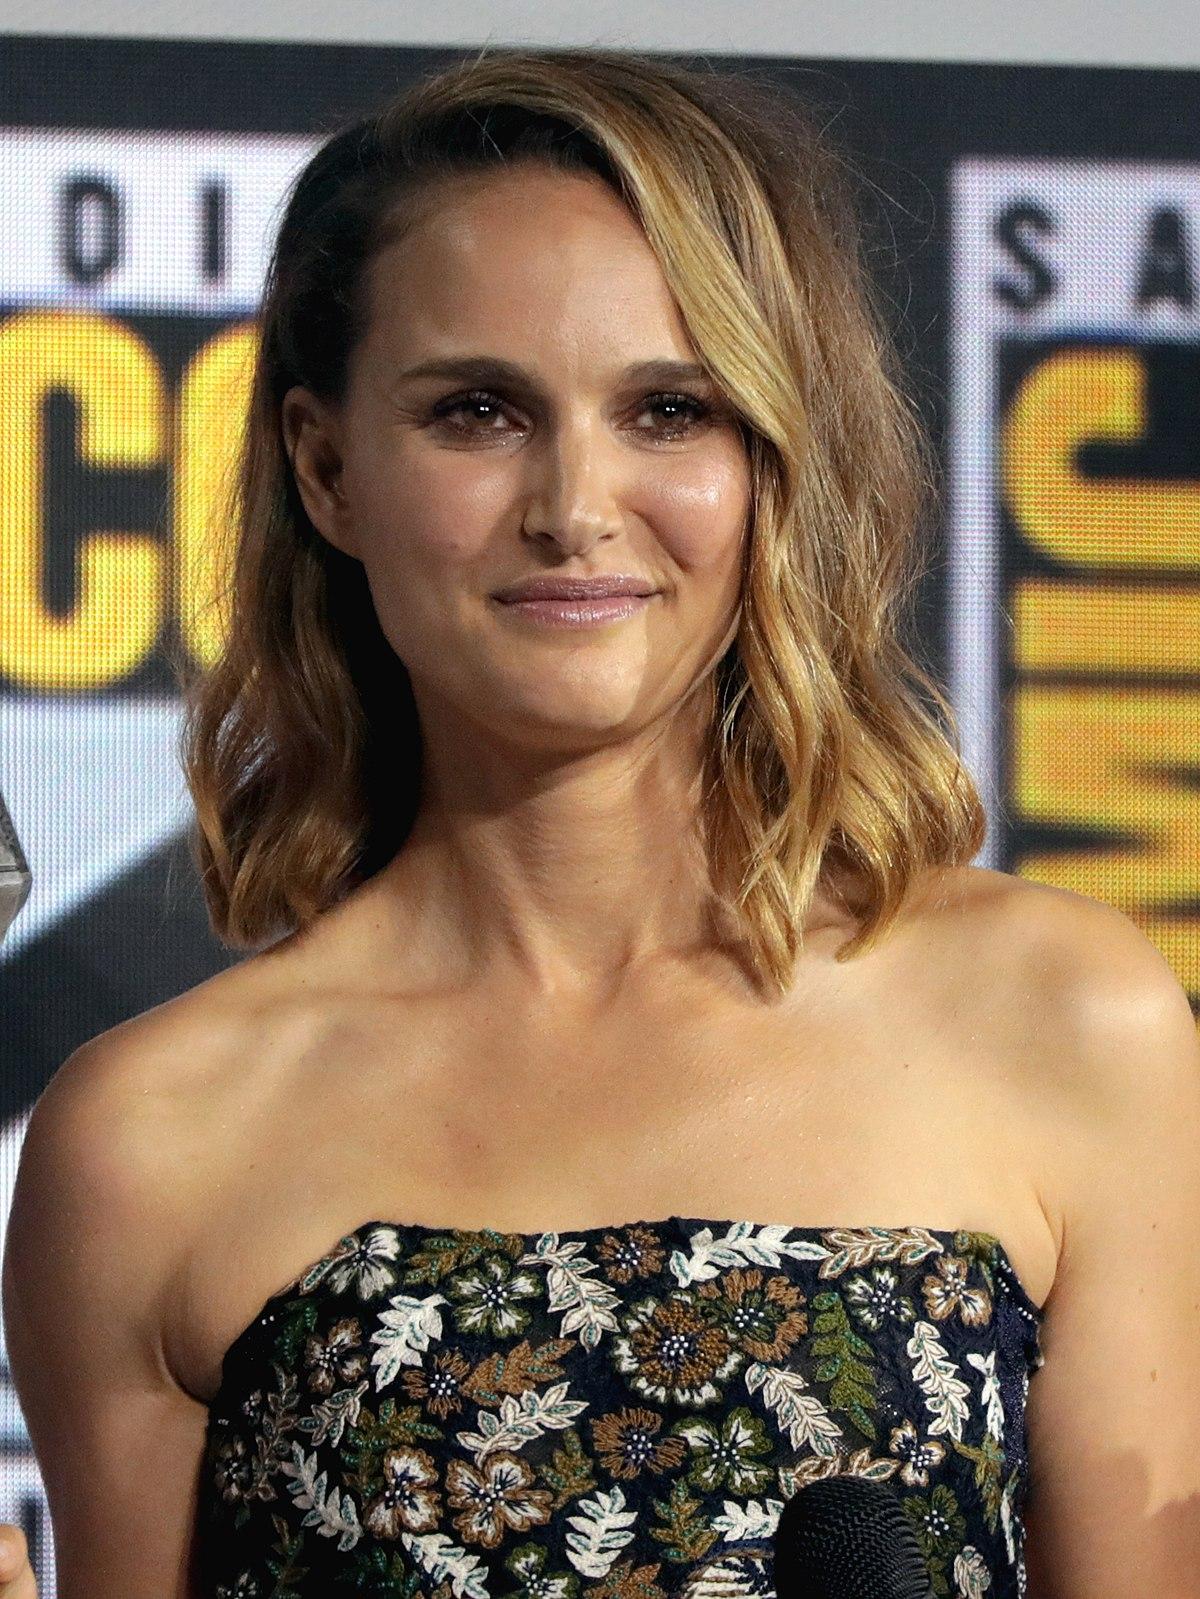 Natalie Portman - Wikipedia